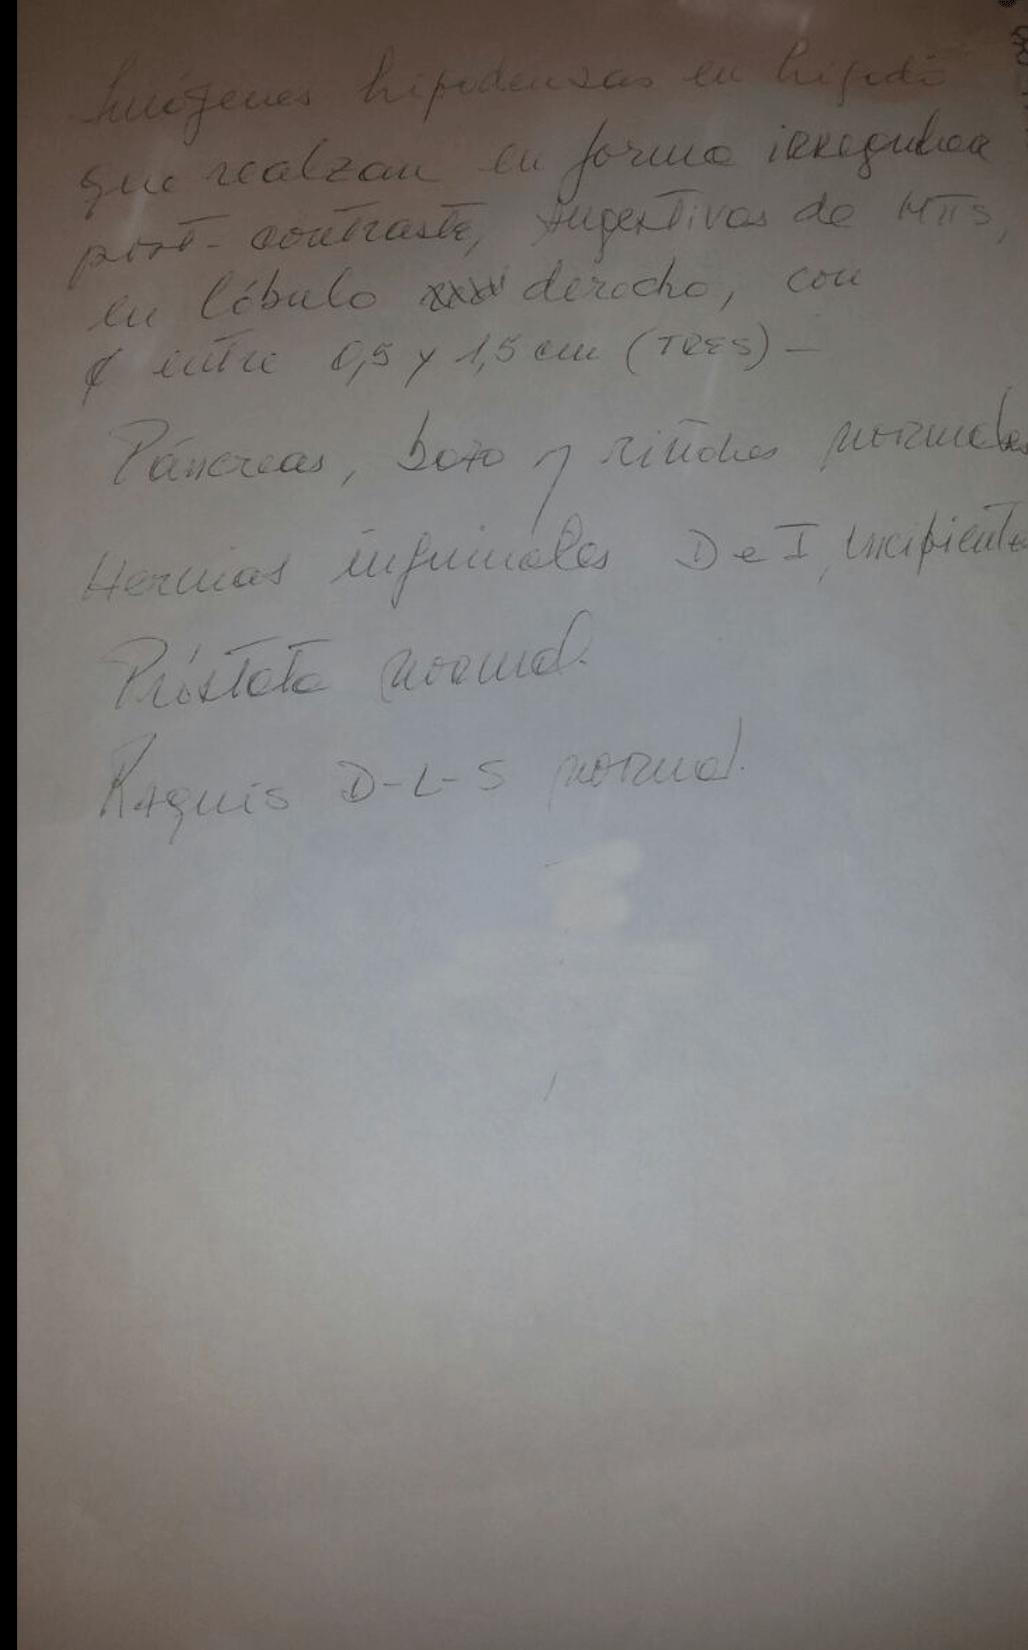 LifEscozul® - Luis 4 - Cáncer de Cólon